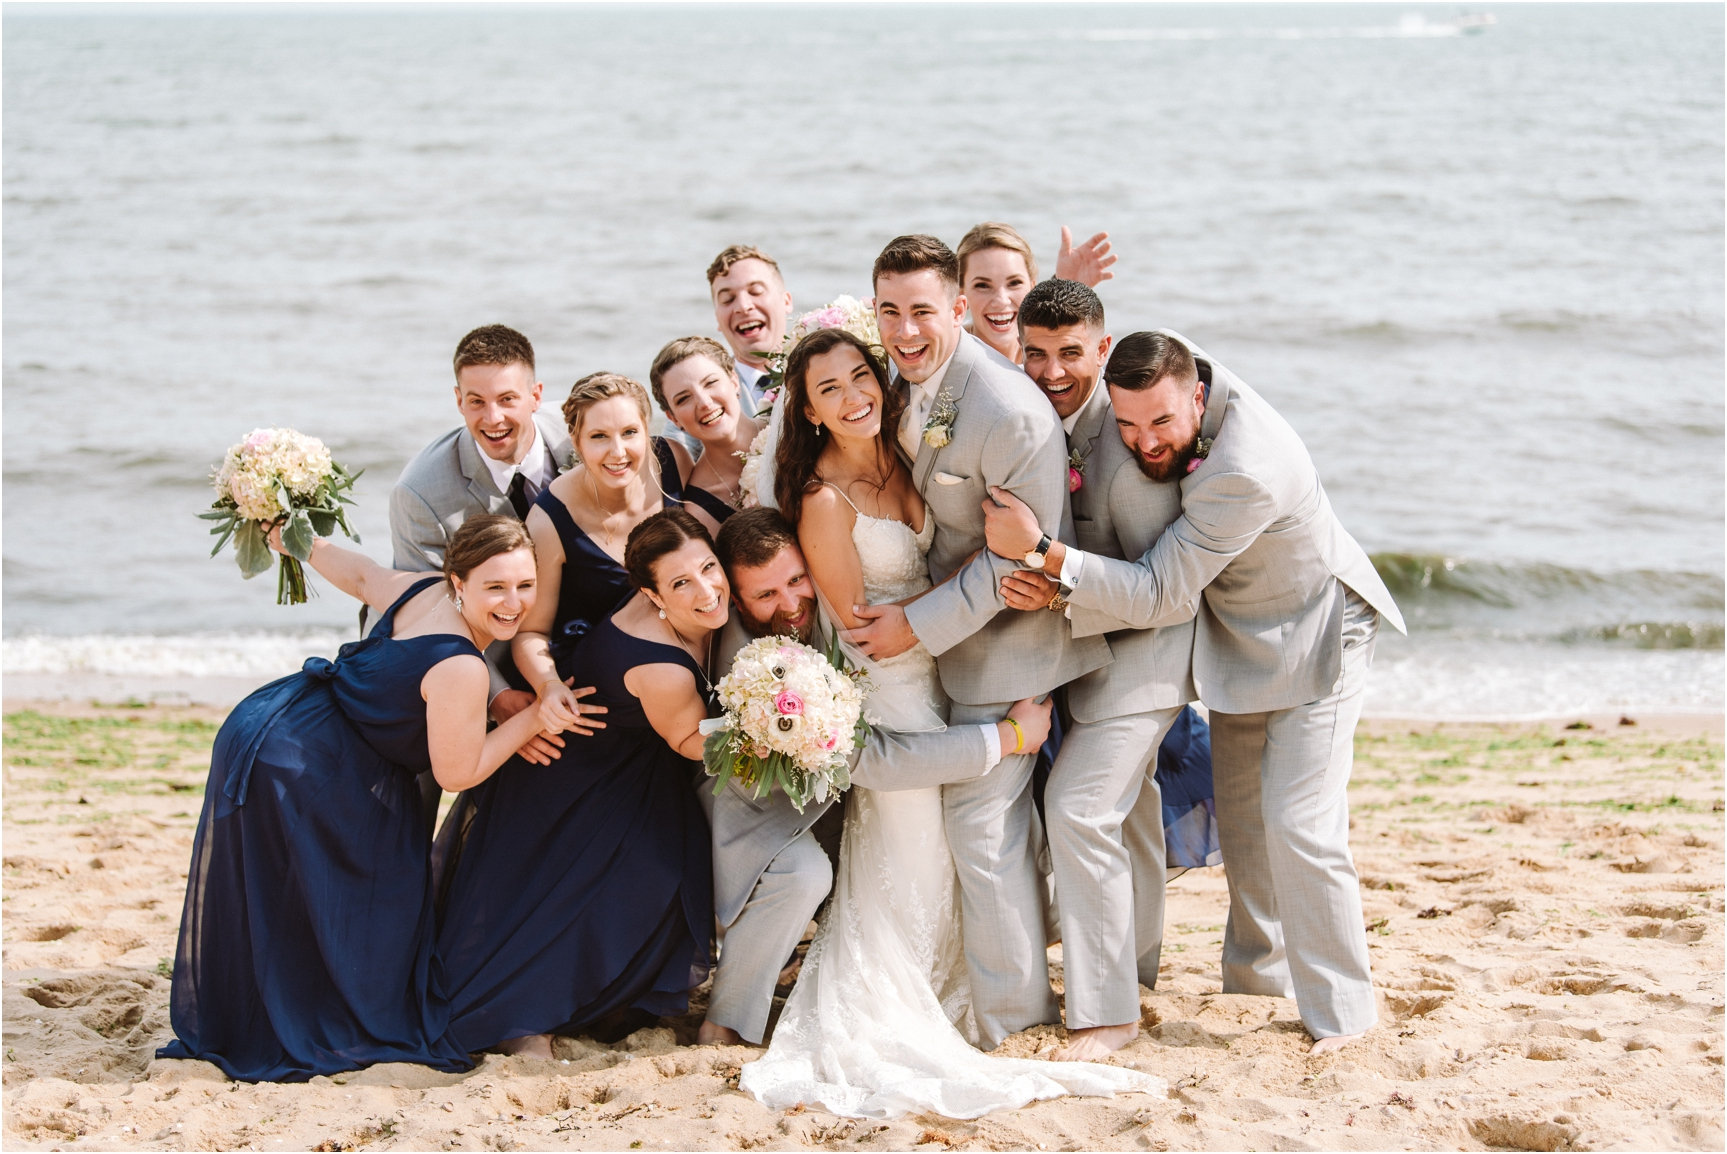 Sarah & Sam Pelham House Cape Cod Wedding Photographer-123.jpg